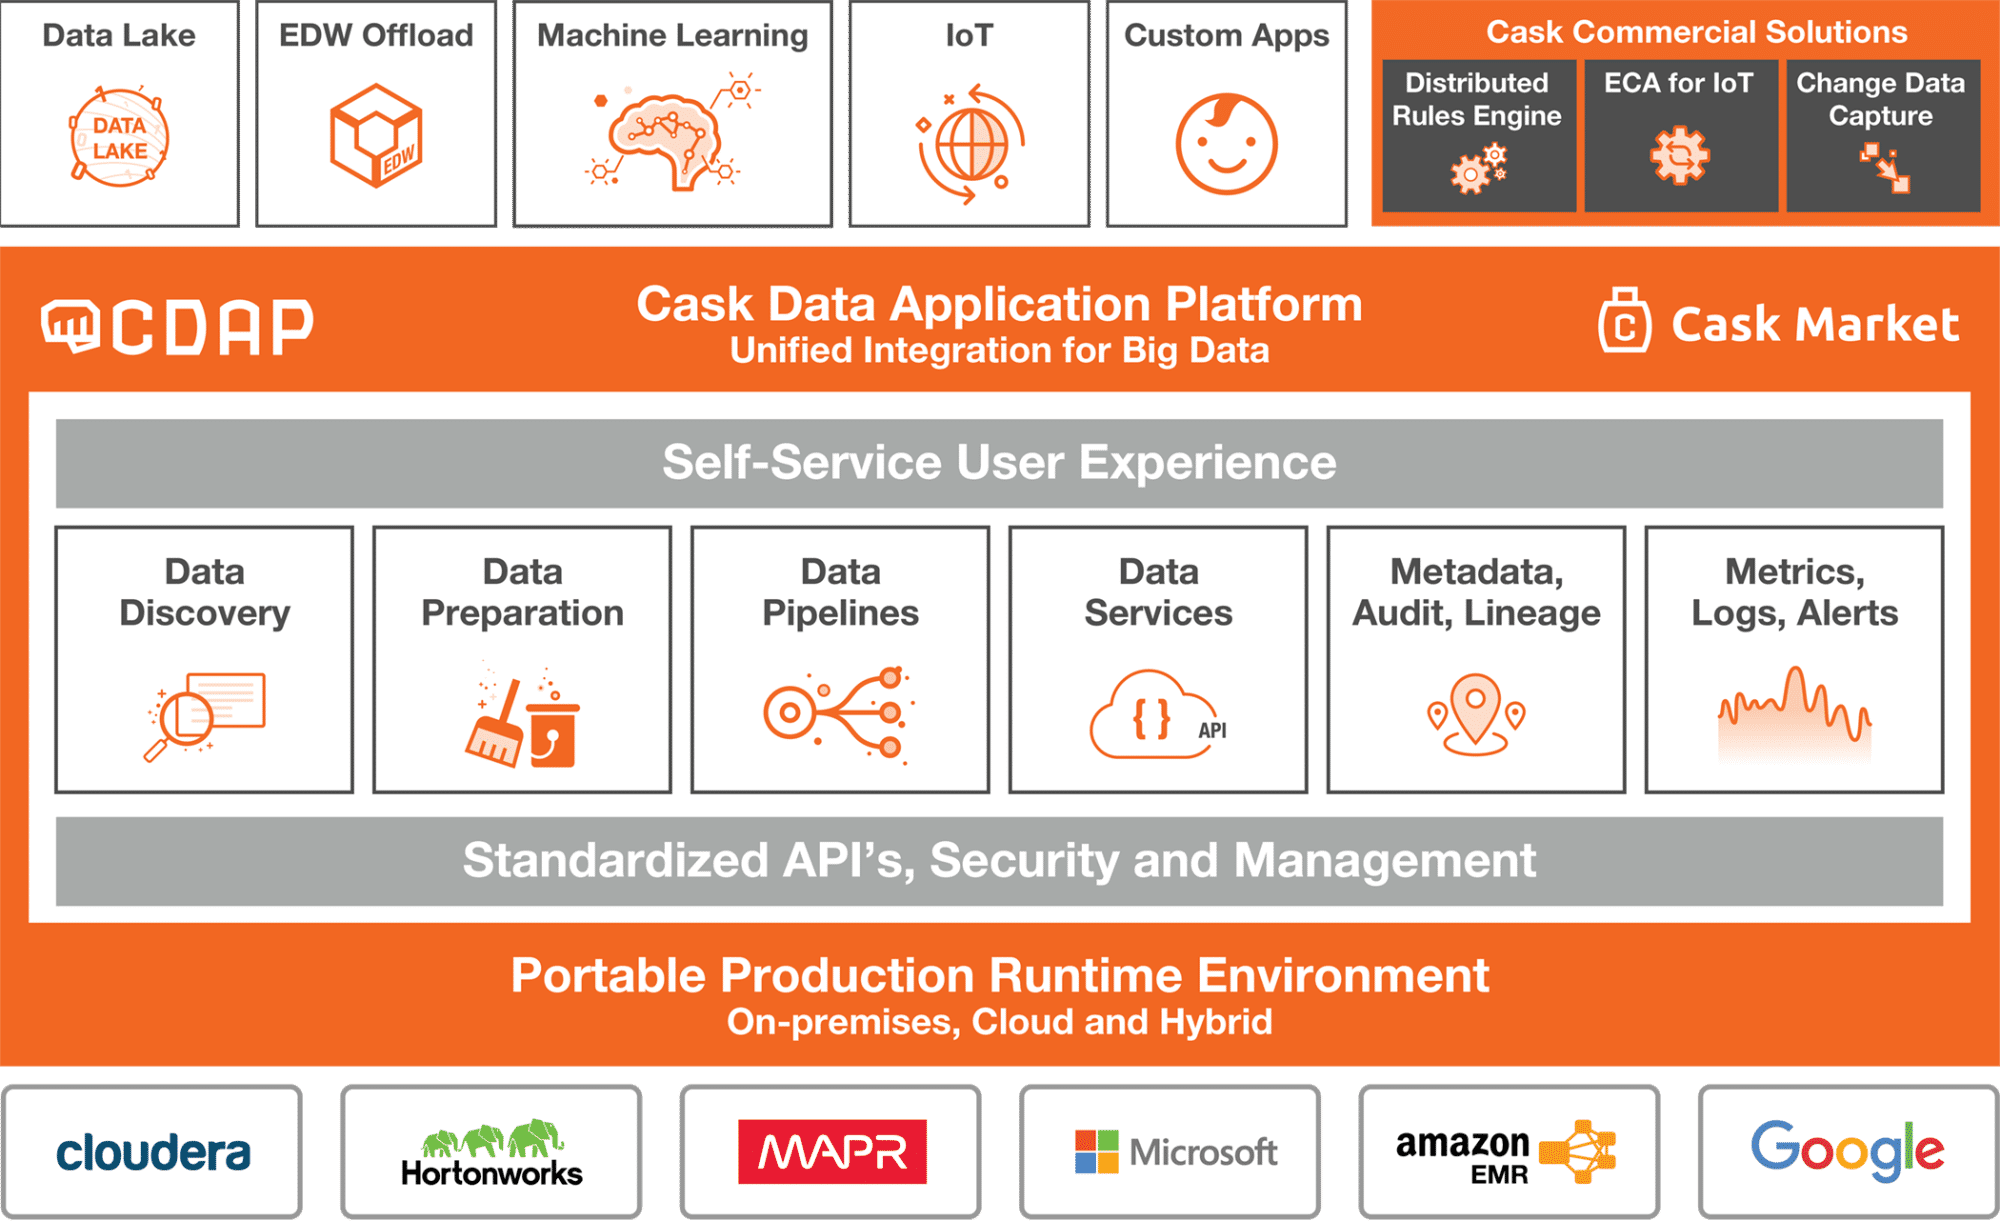 Die Cask Data Application Platform.